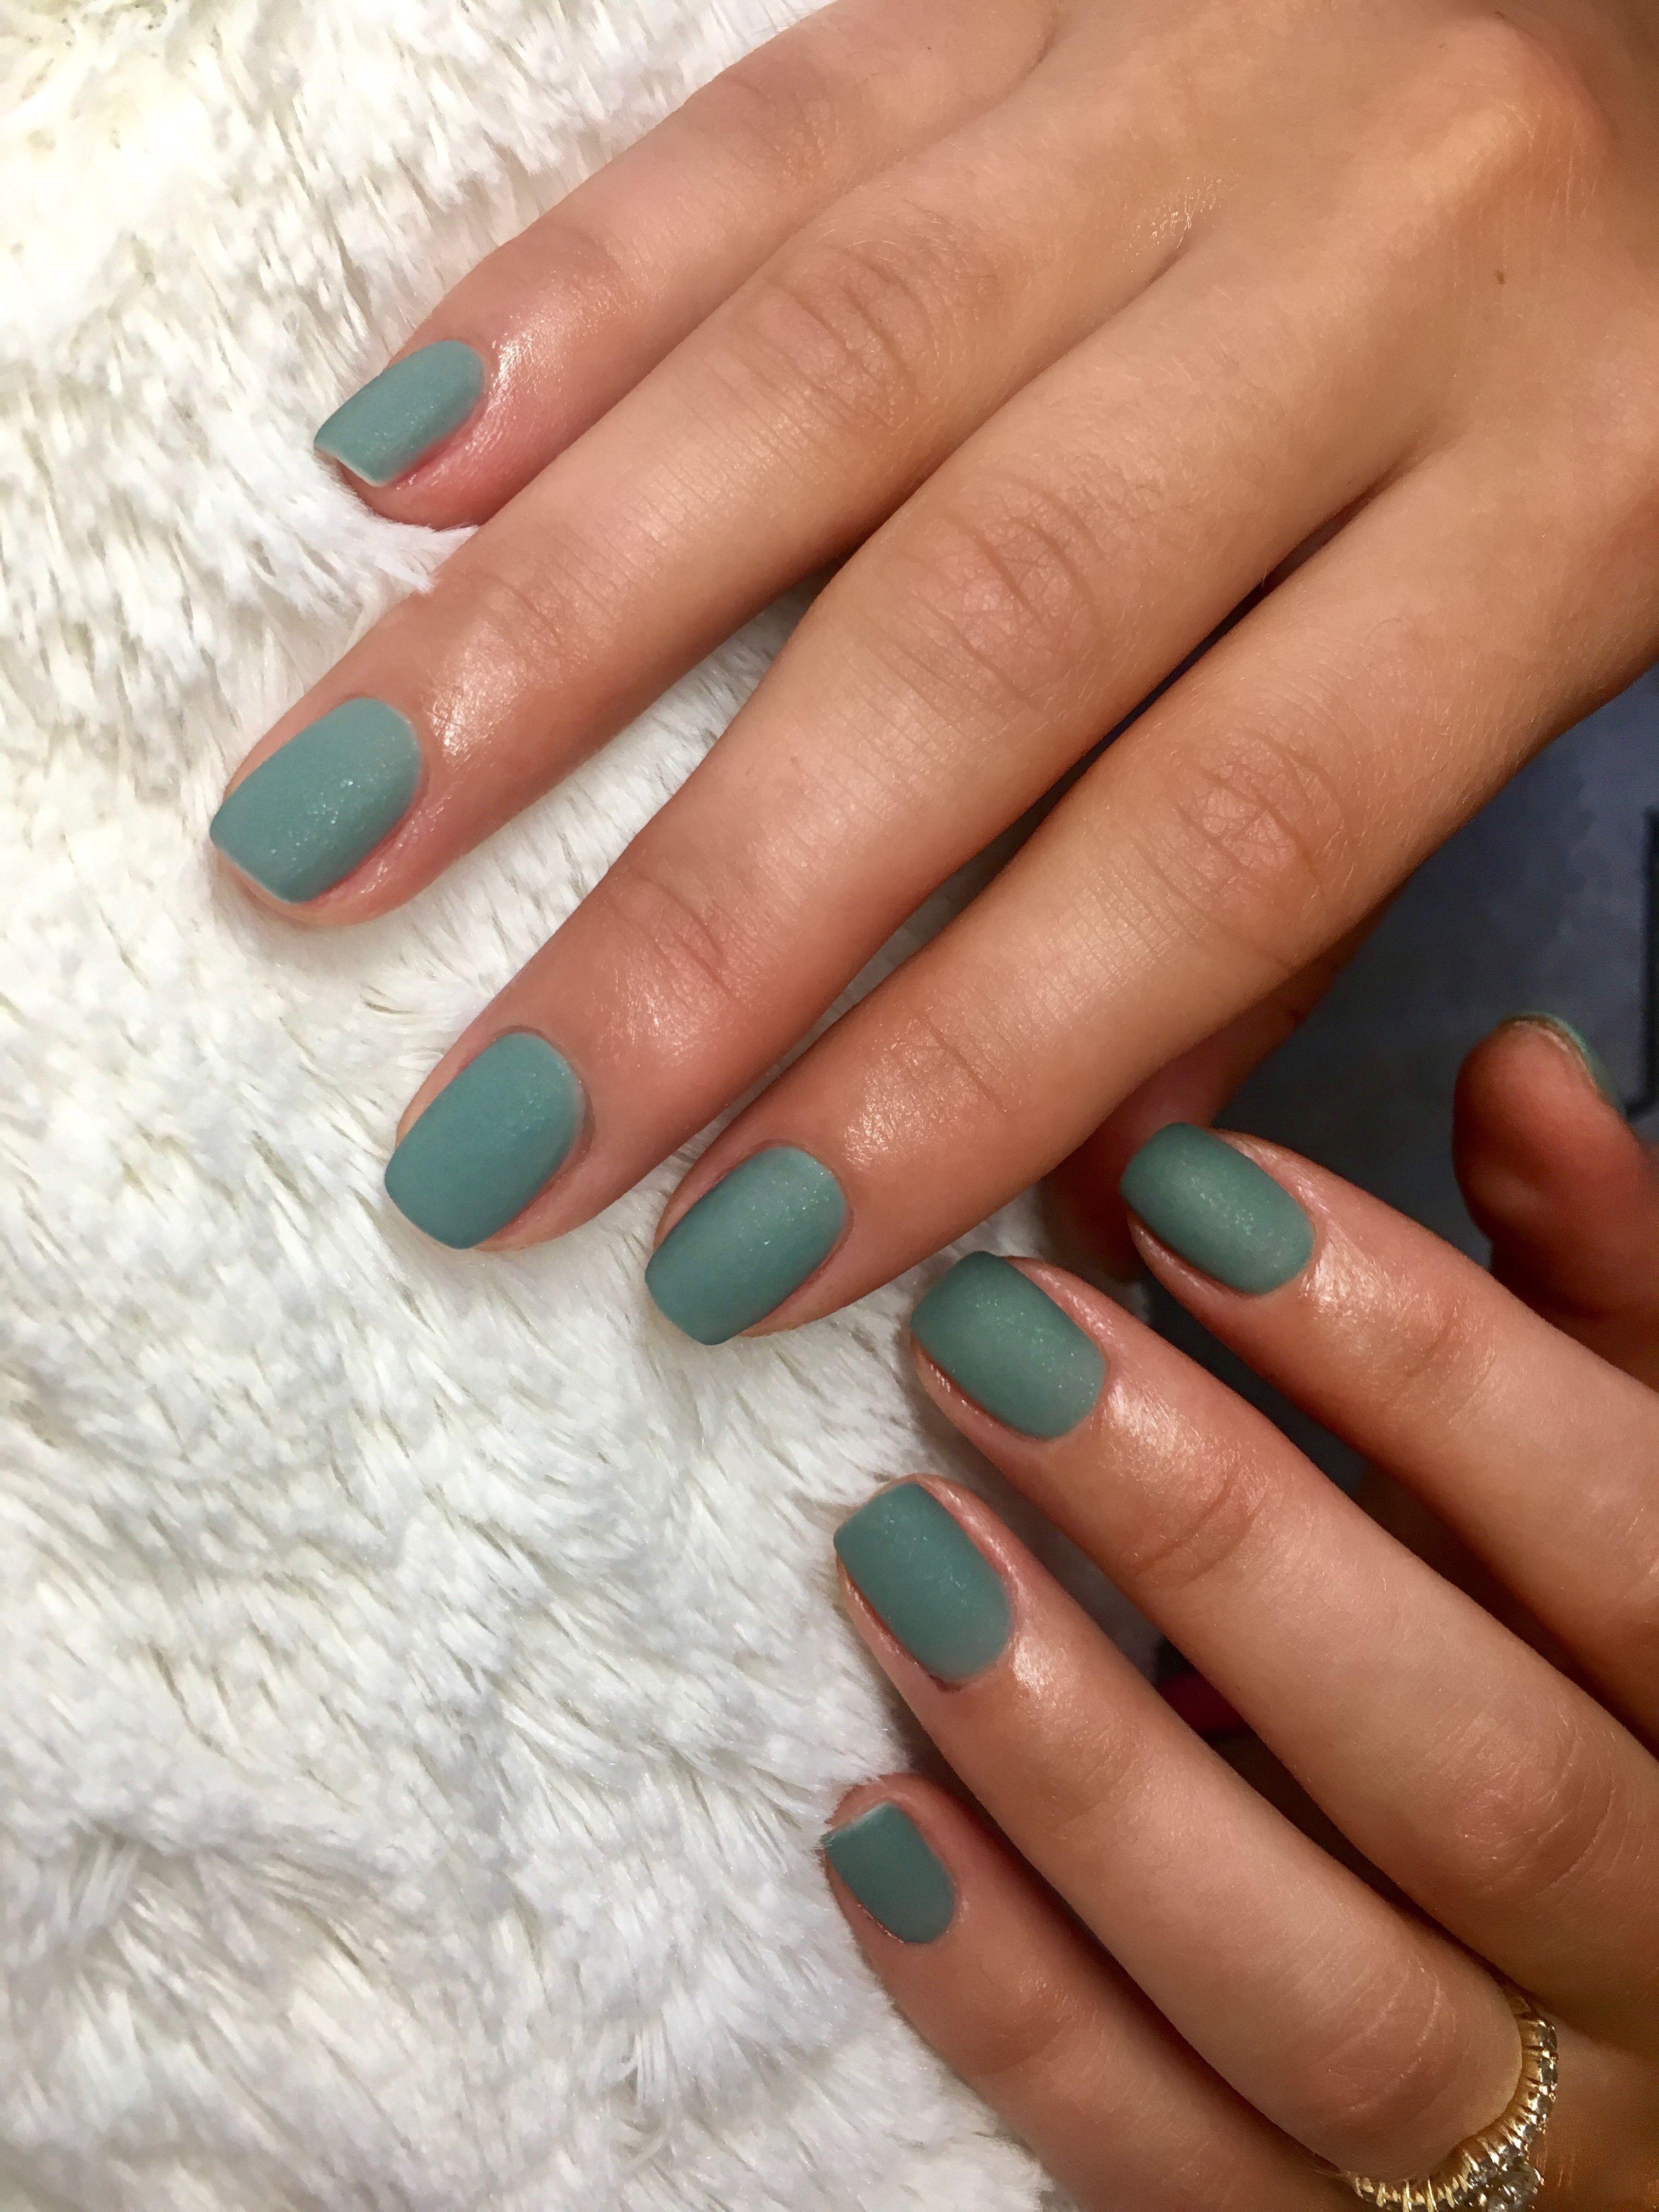 Hunter green matte shellac nails | Nail-ed it! | Pinterest | Shellac ...